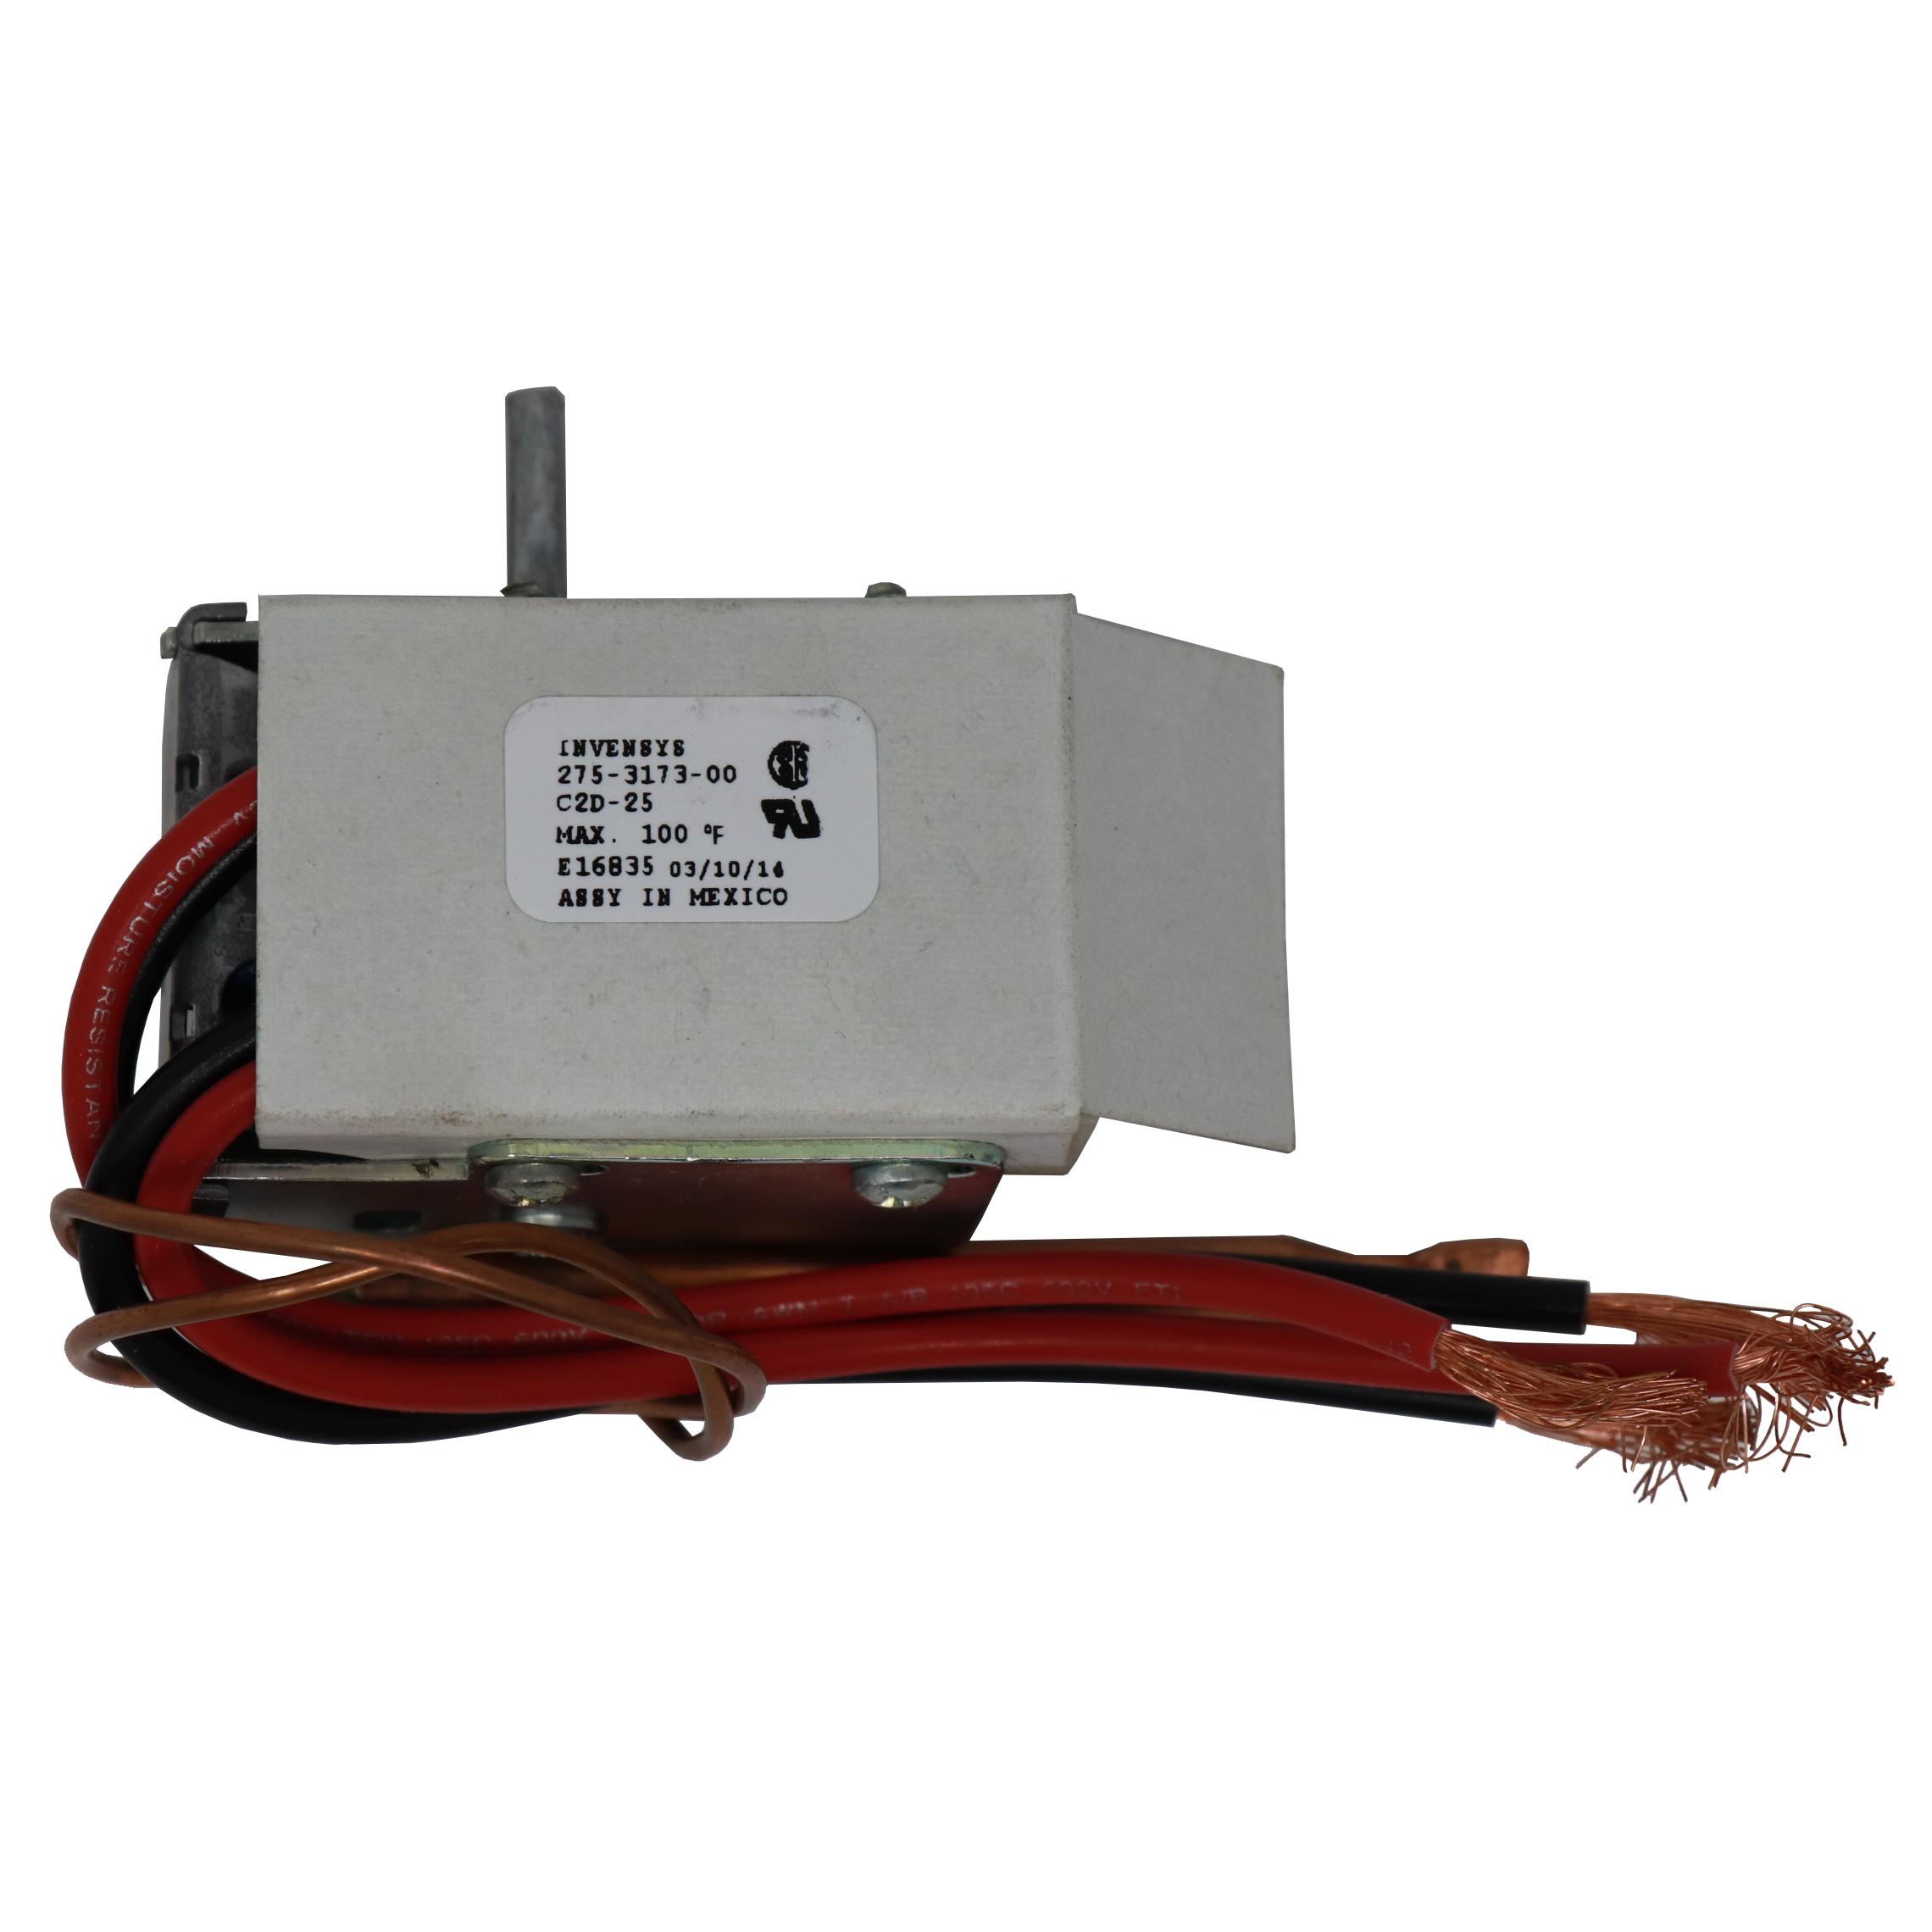 King Electrical KBT-2